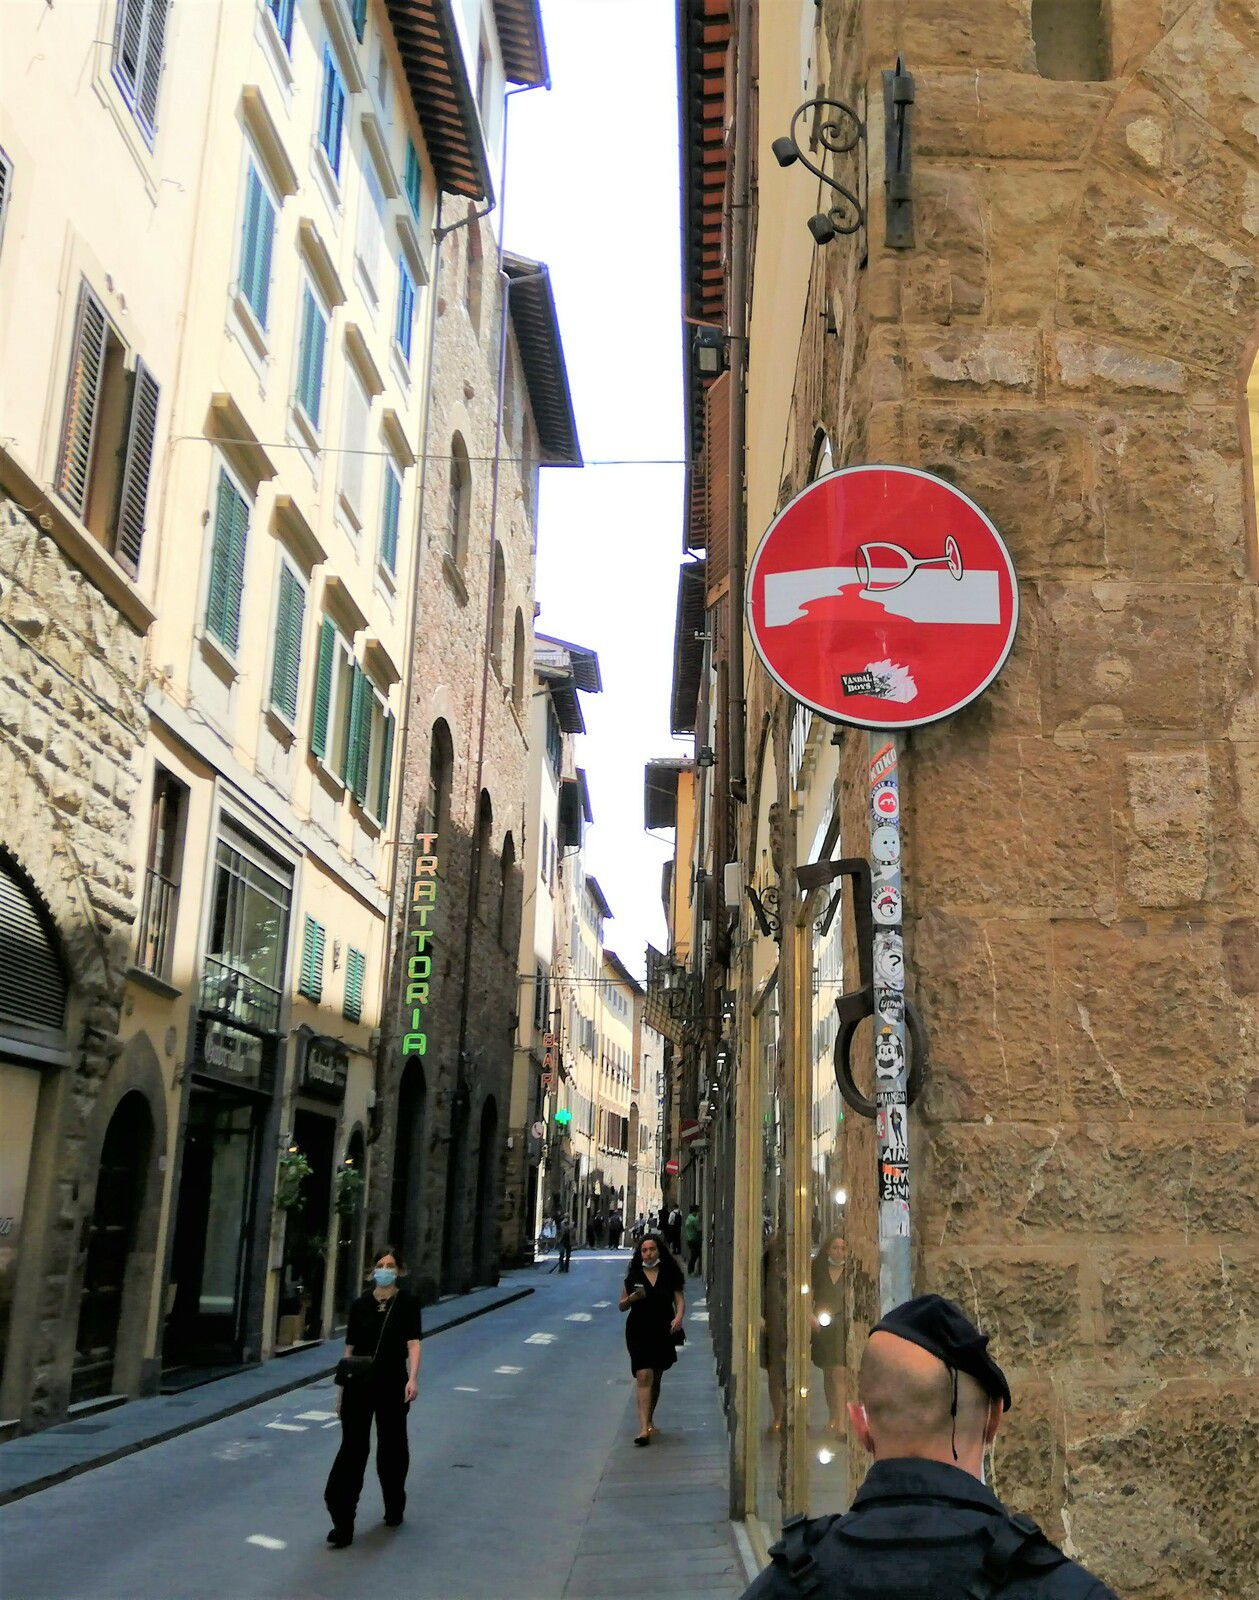 ITALIE - La Toscane - Florence (2)